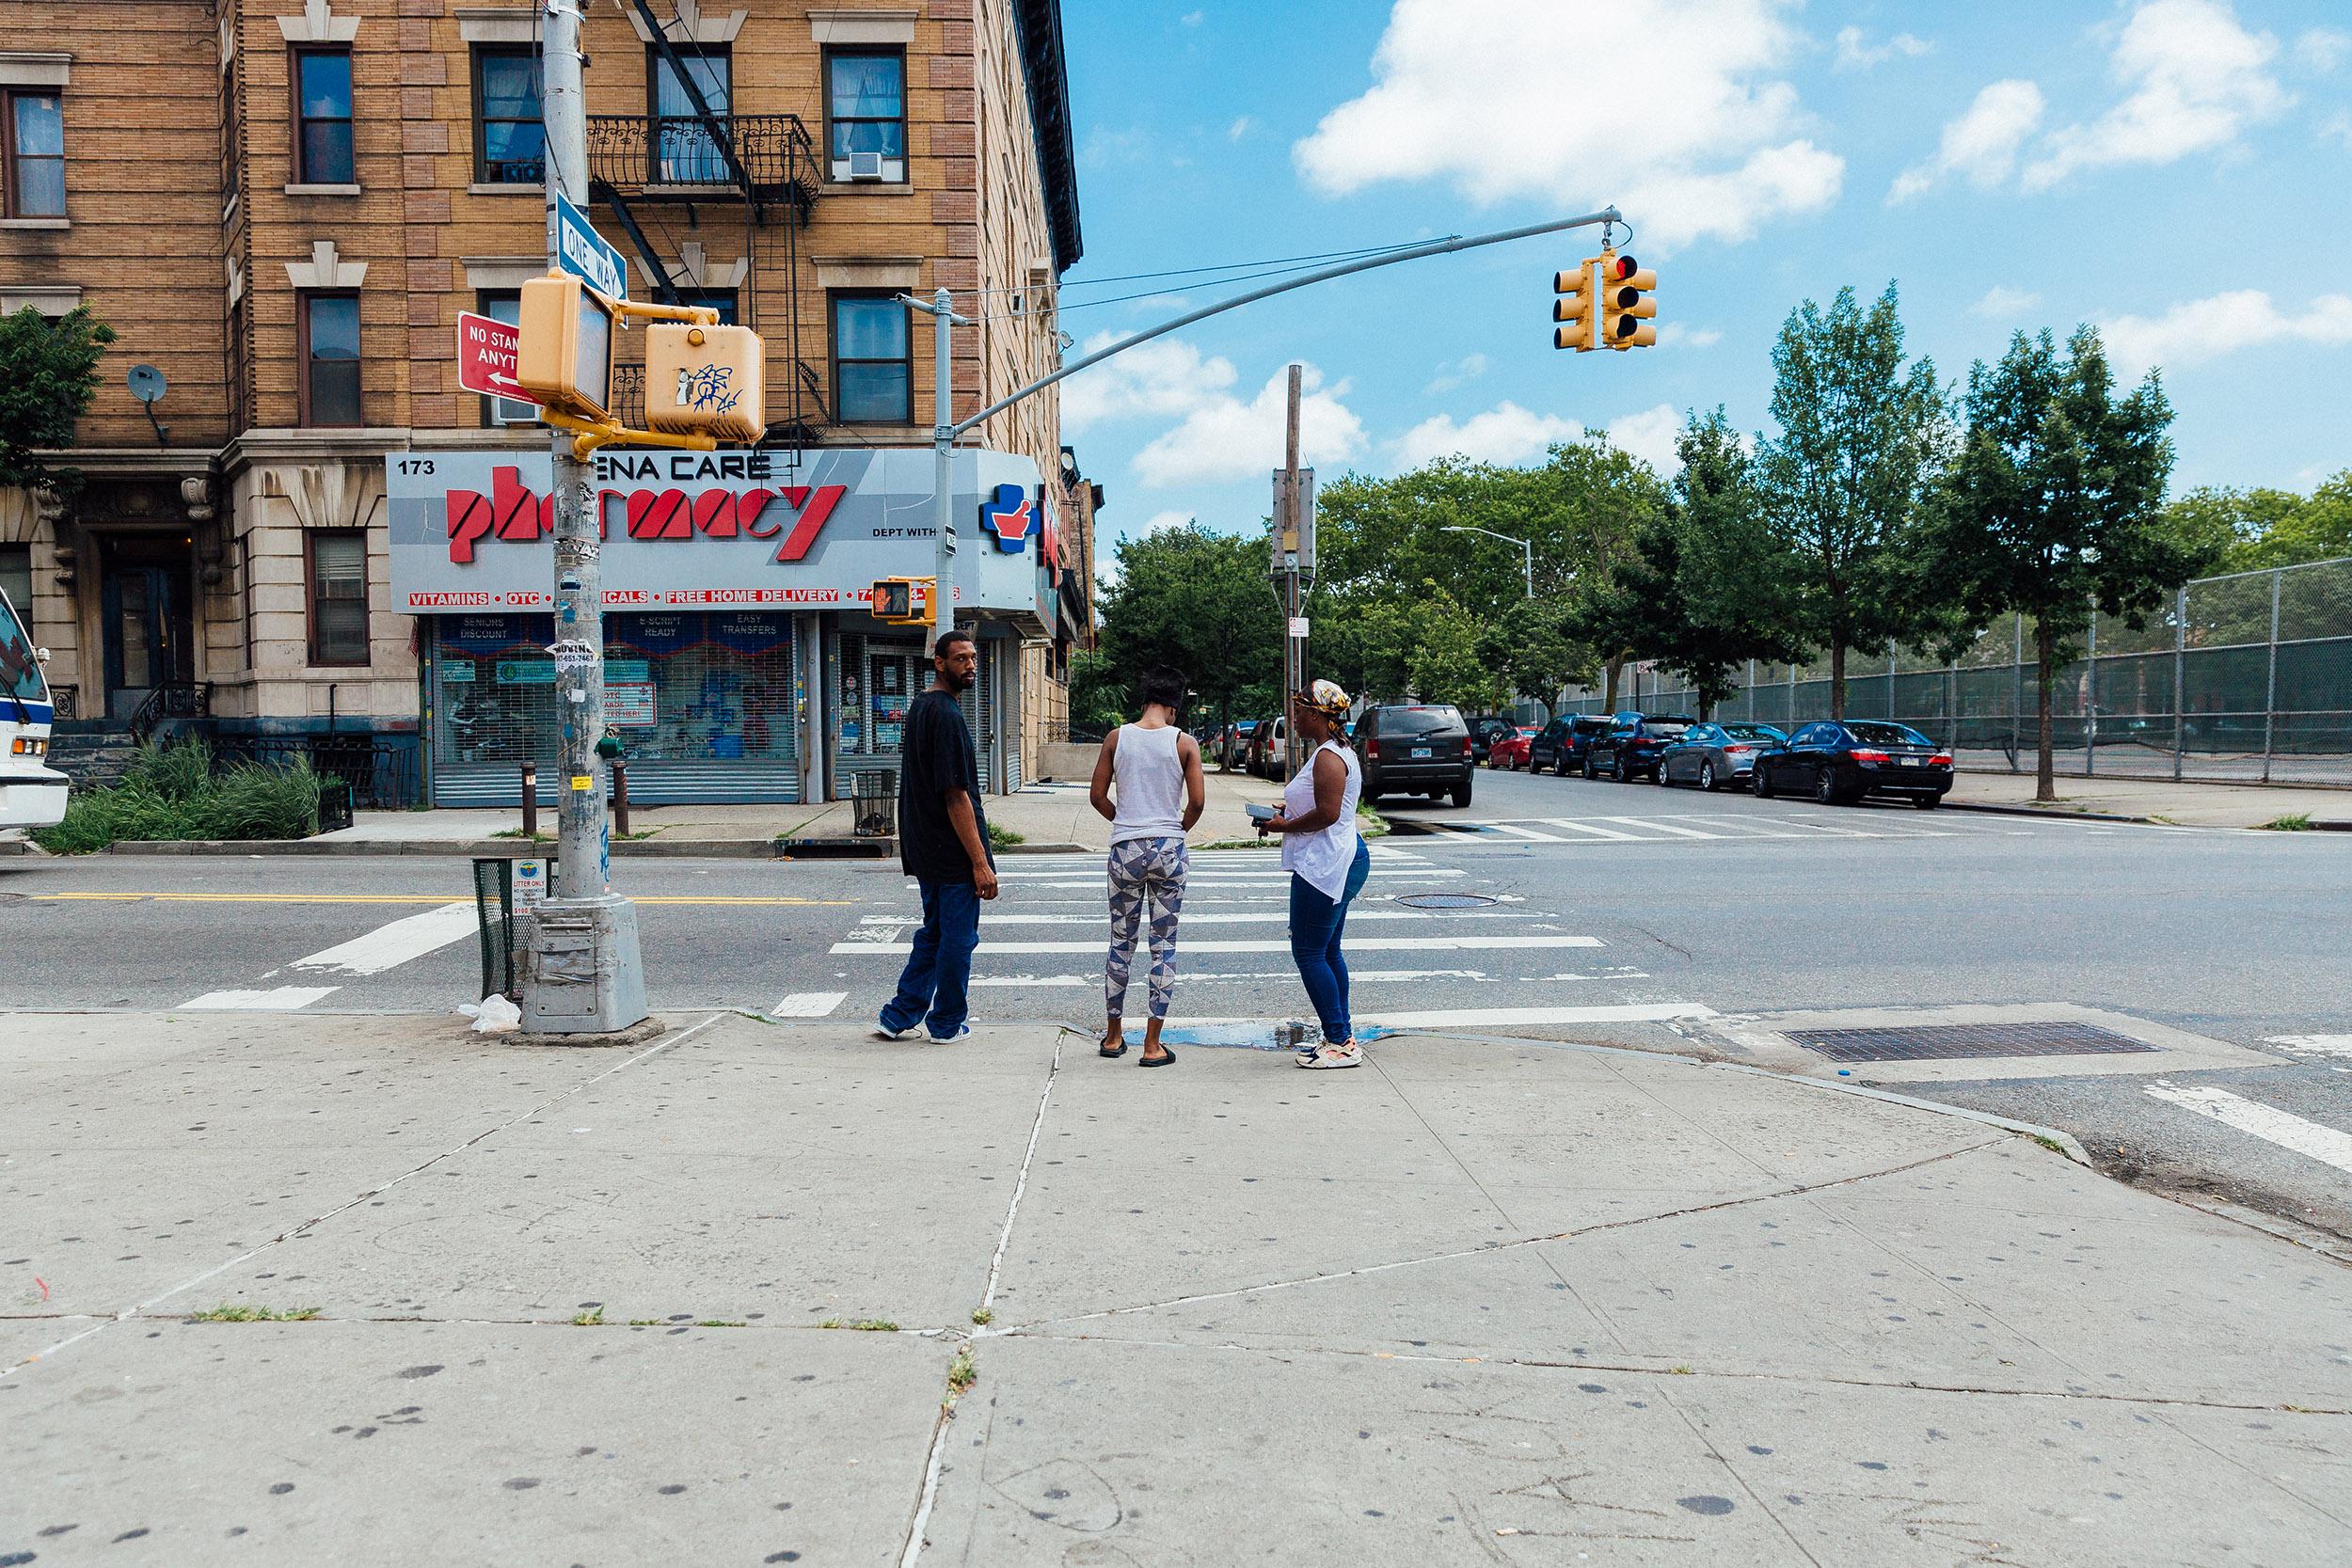 NYC_072018 (28 of 36).jpg